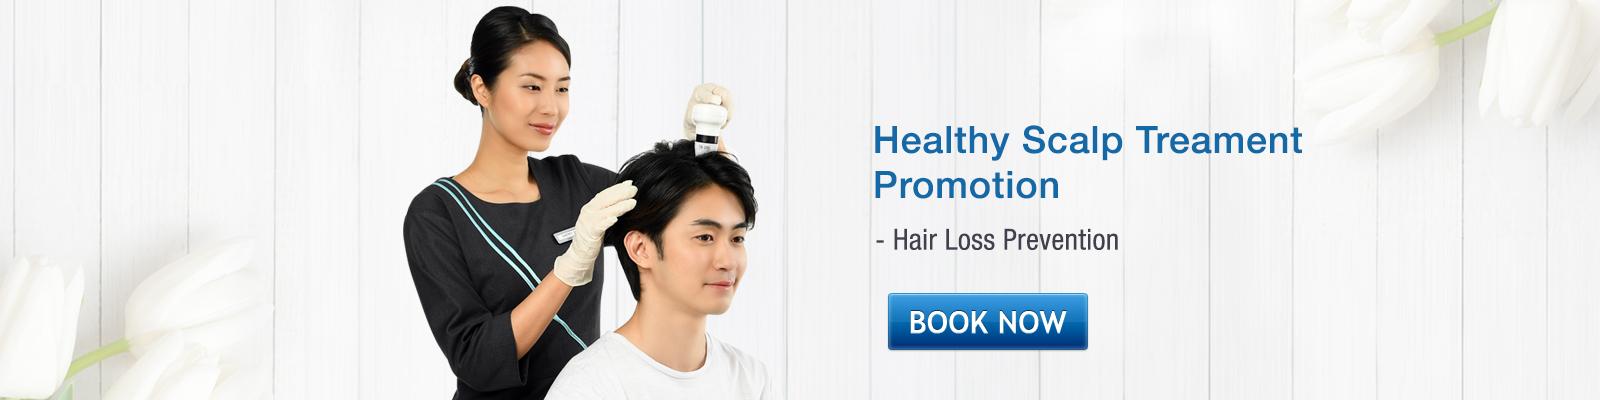 Healthy Scalp Treatment Promotion